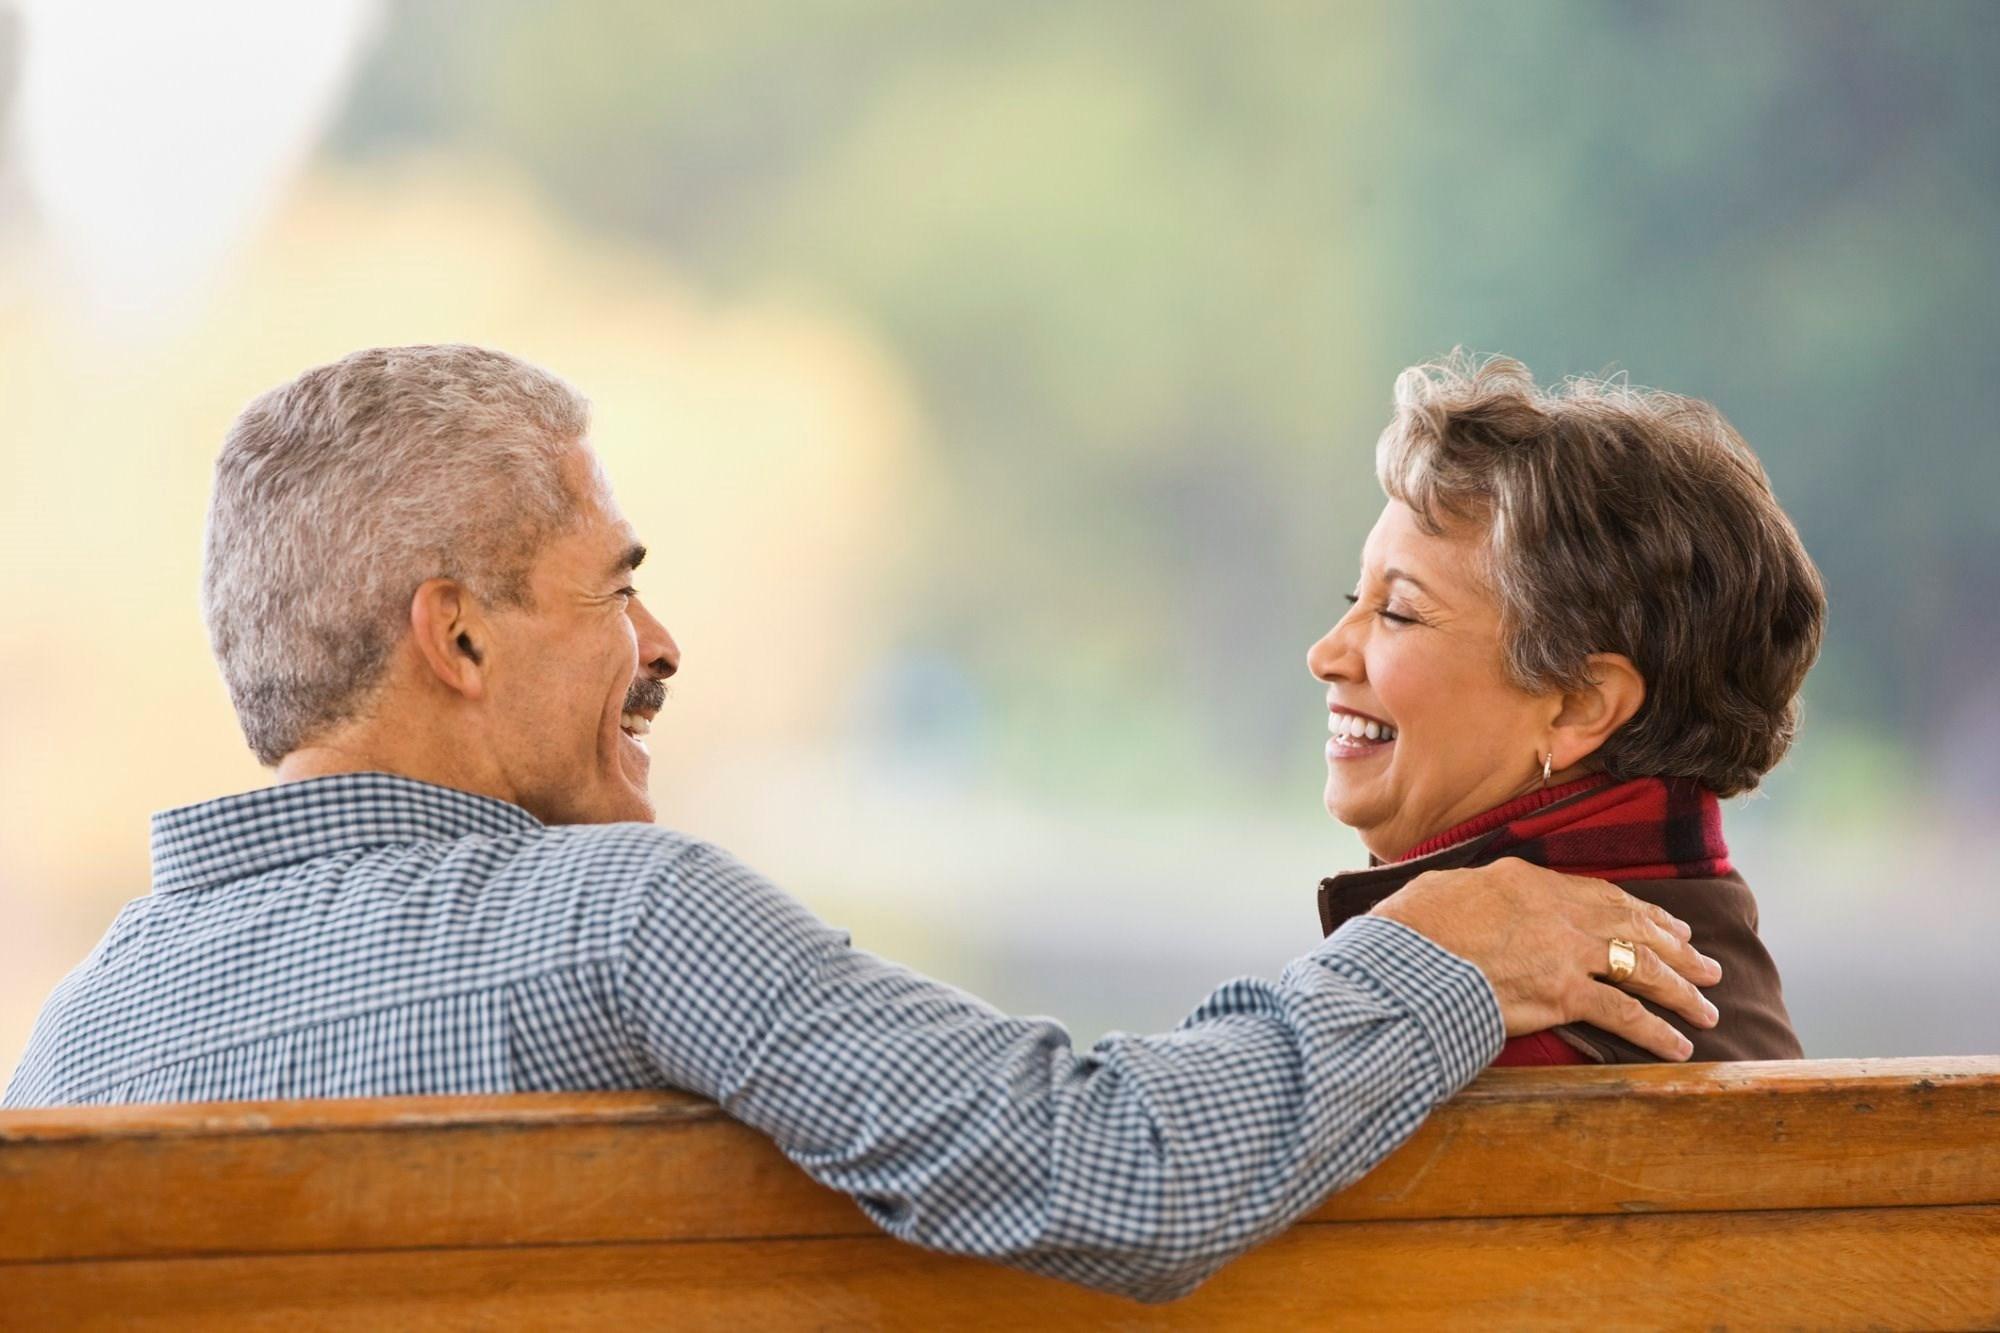 Testosterone Solution Effective for Hypogonadism Over 9 Months